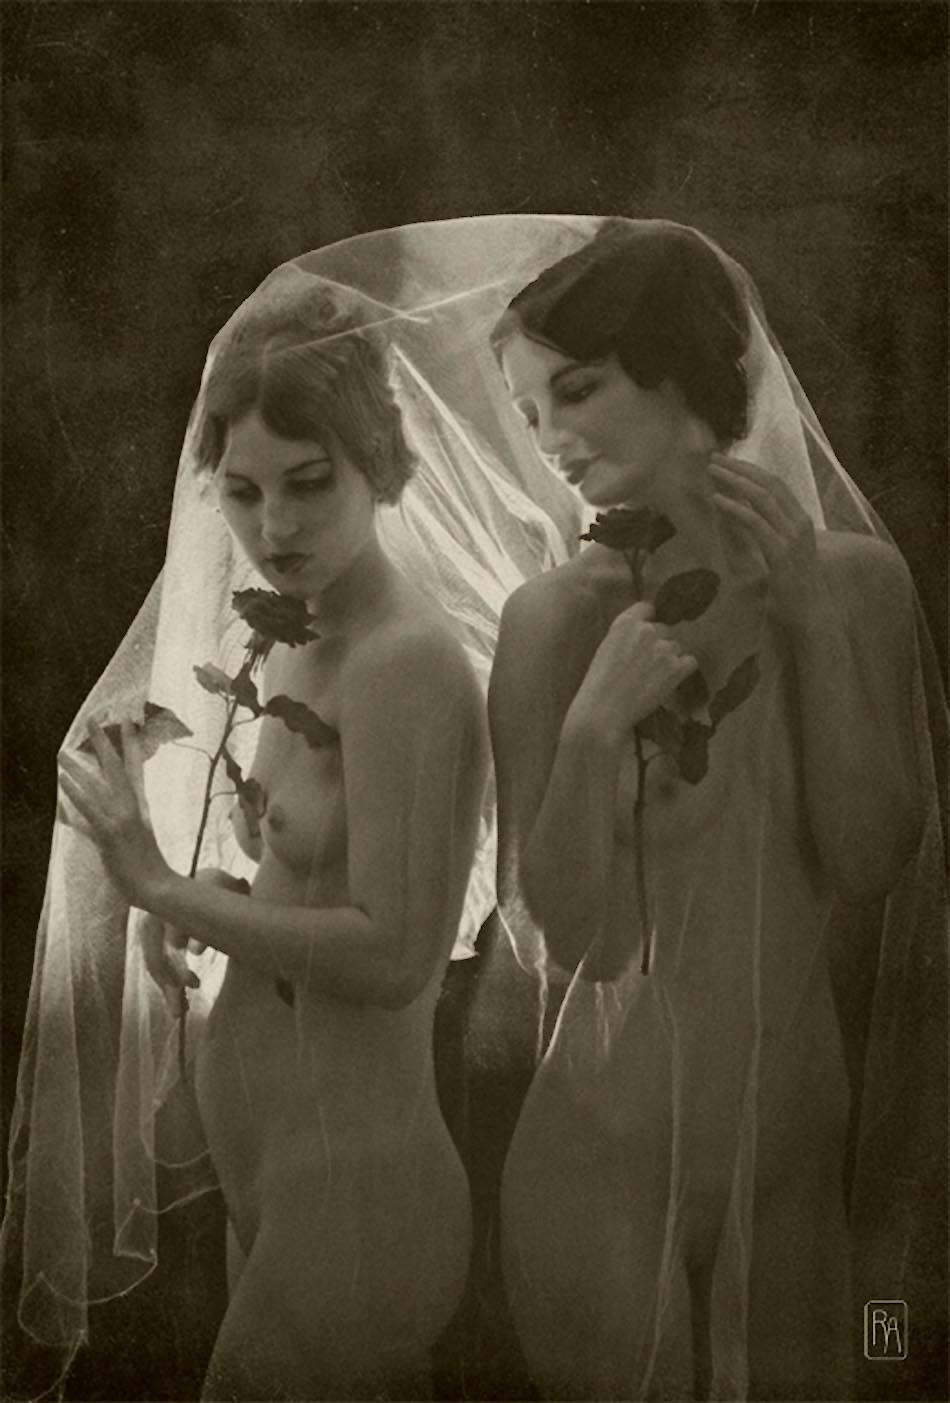 Retroatelier - Model Dixie and Rada Black Roses, 2009